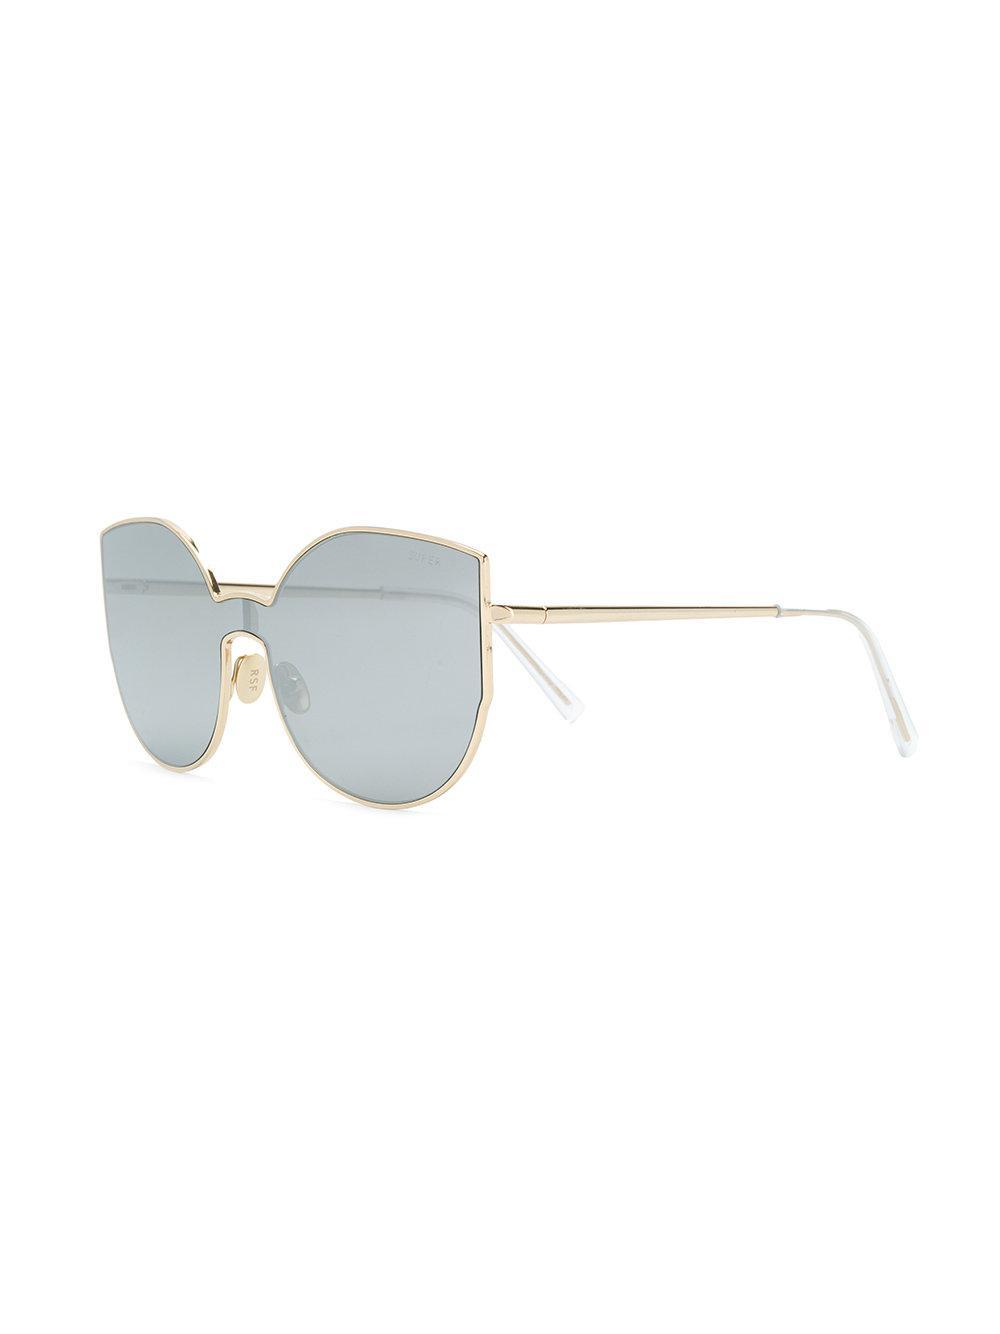 In Lyst Oversized Retrosuperfuture Metallic Sunglasses tPqP7rw